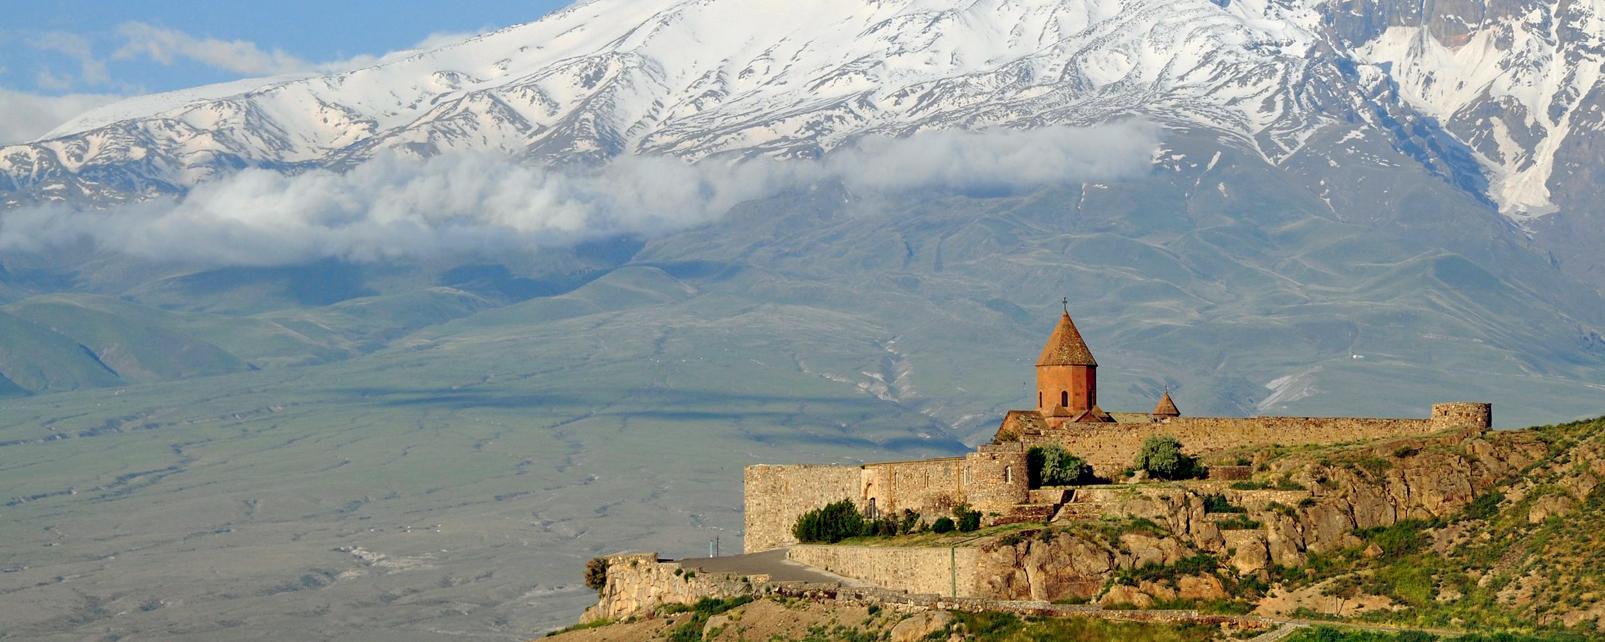 armenie vins armenie